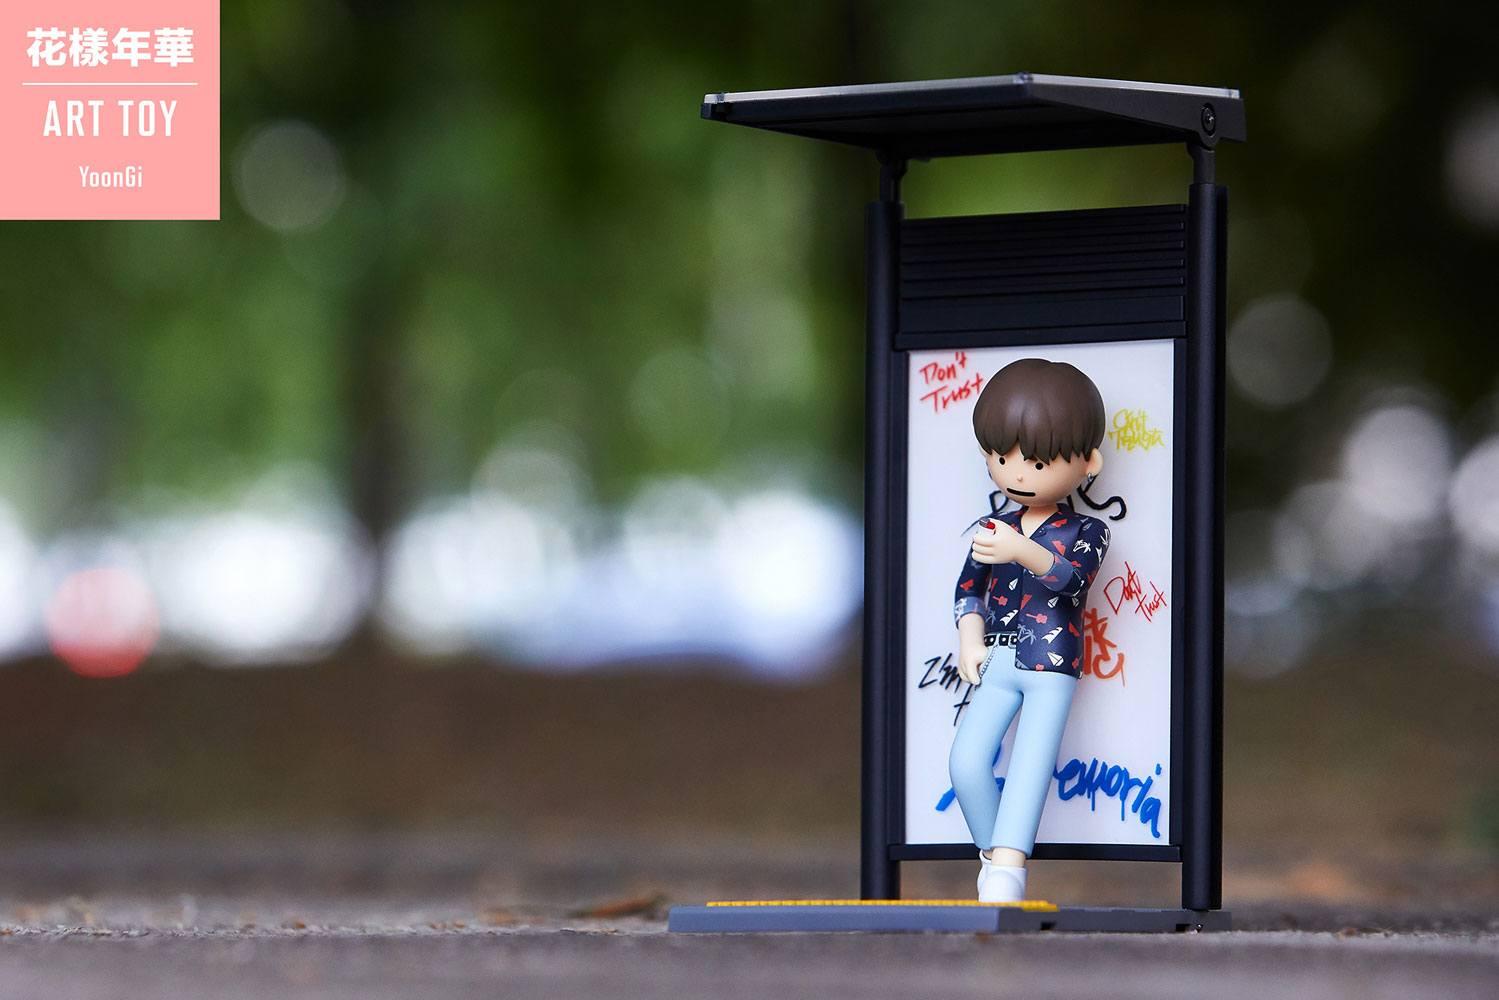 BTS Art Toy PVC Statue Suga (Min Yoongi) 15 cm